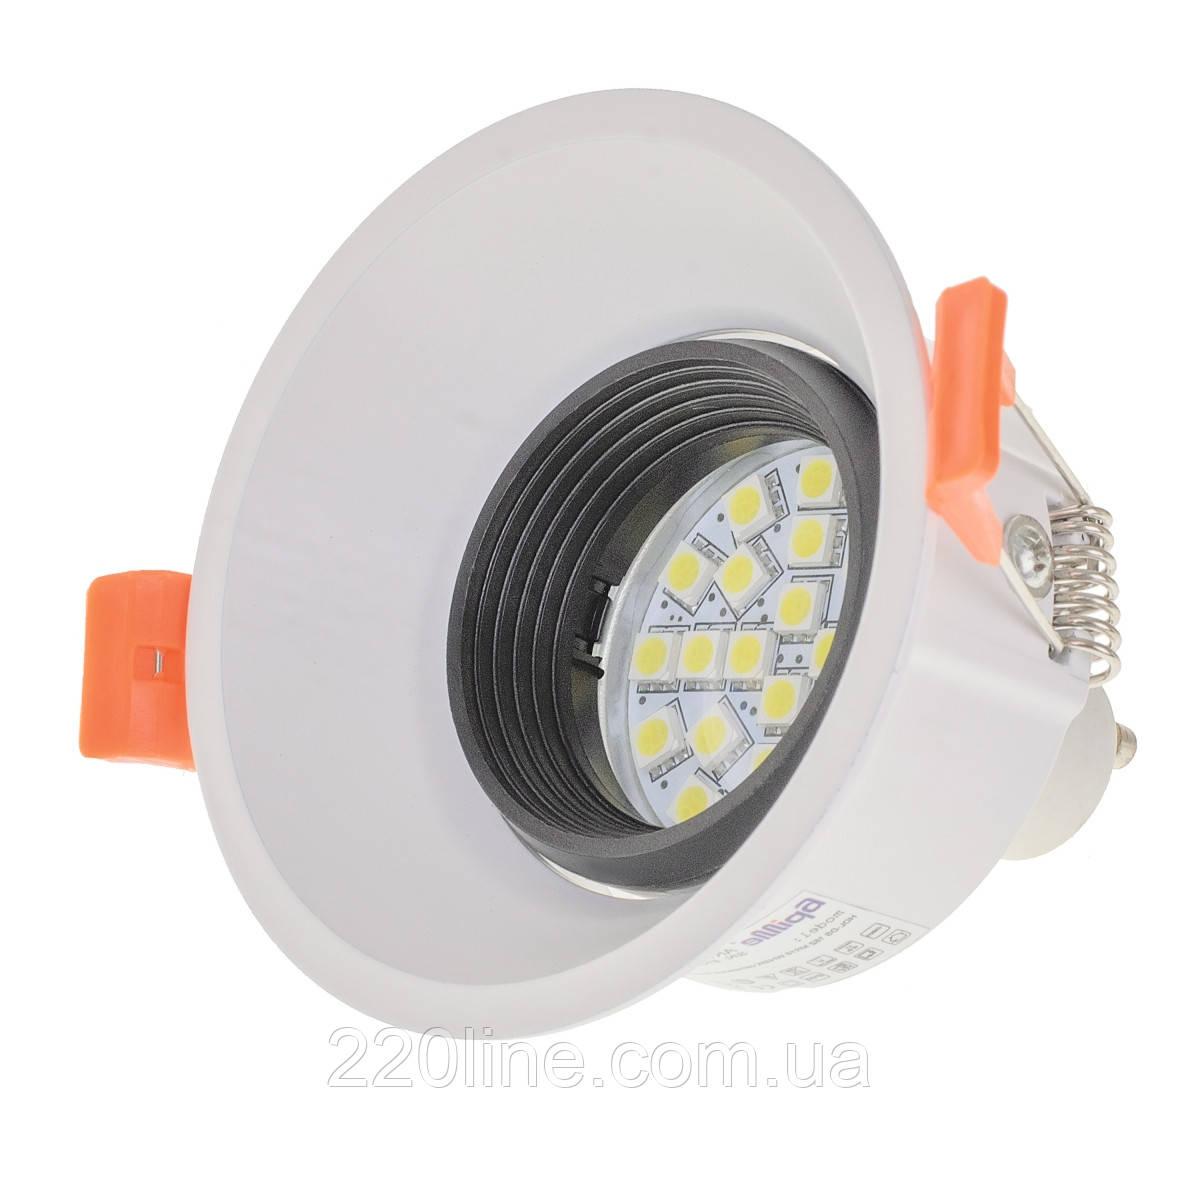 Светильник точечный HDL-DS 162 MR16 WH/BK